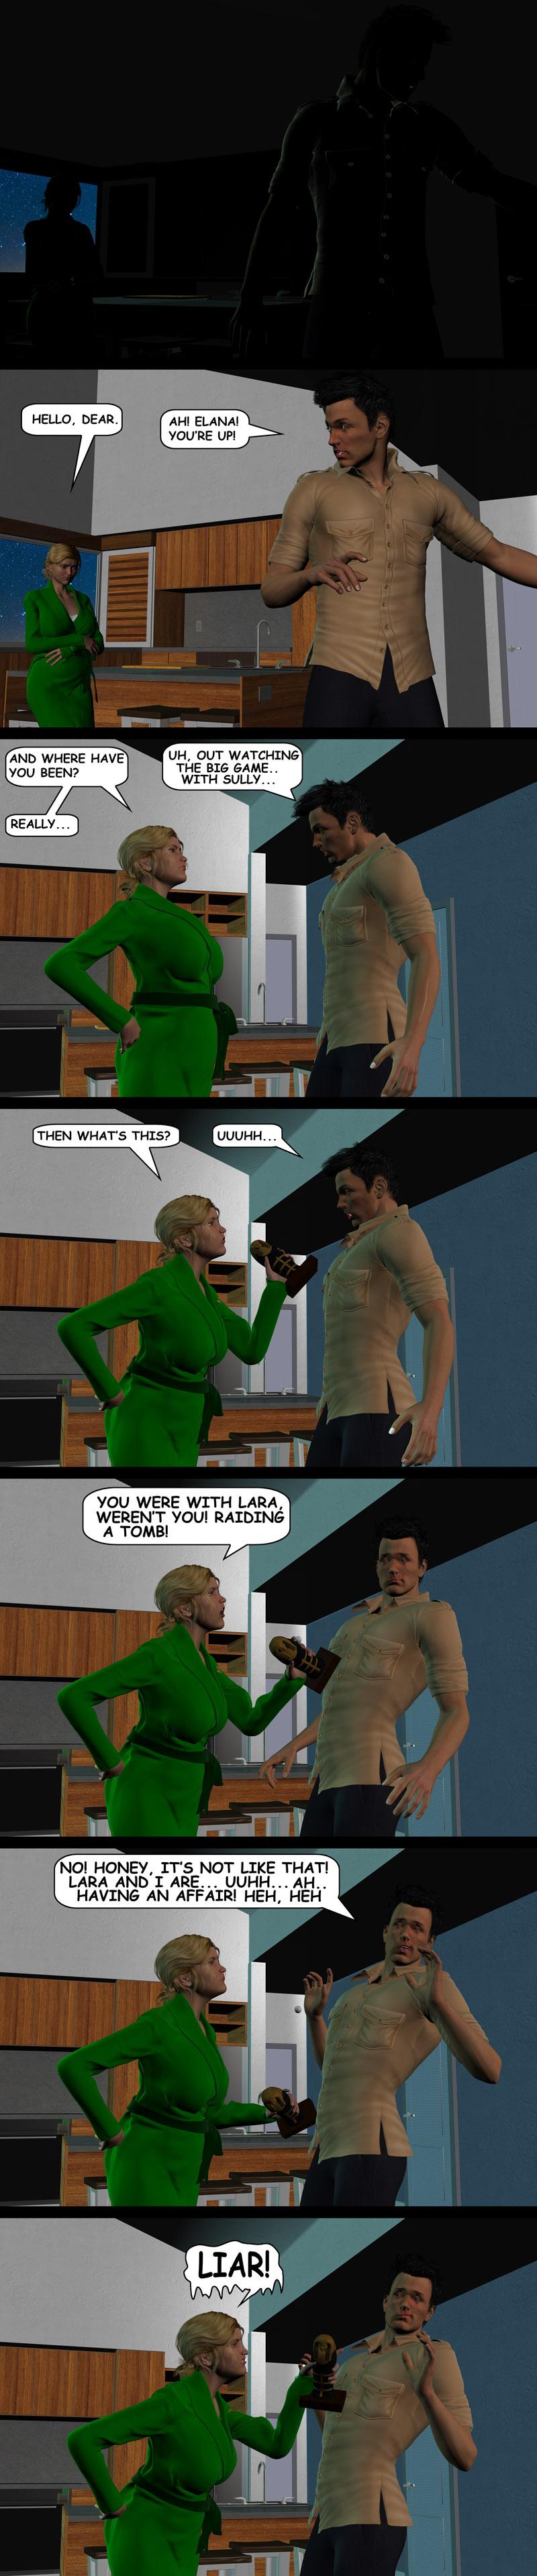 NATHAN DRAKE THE OTHER WOMAN